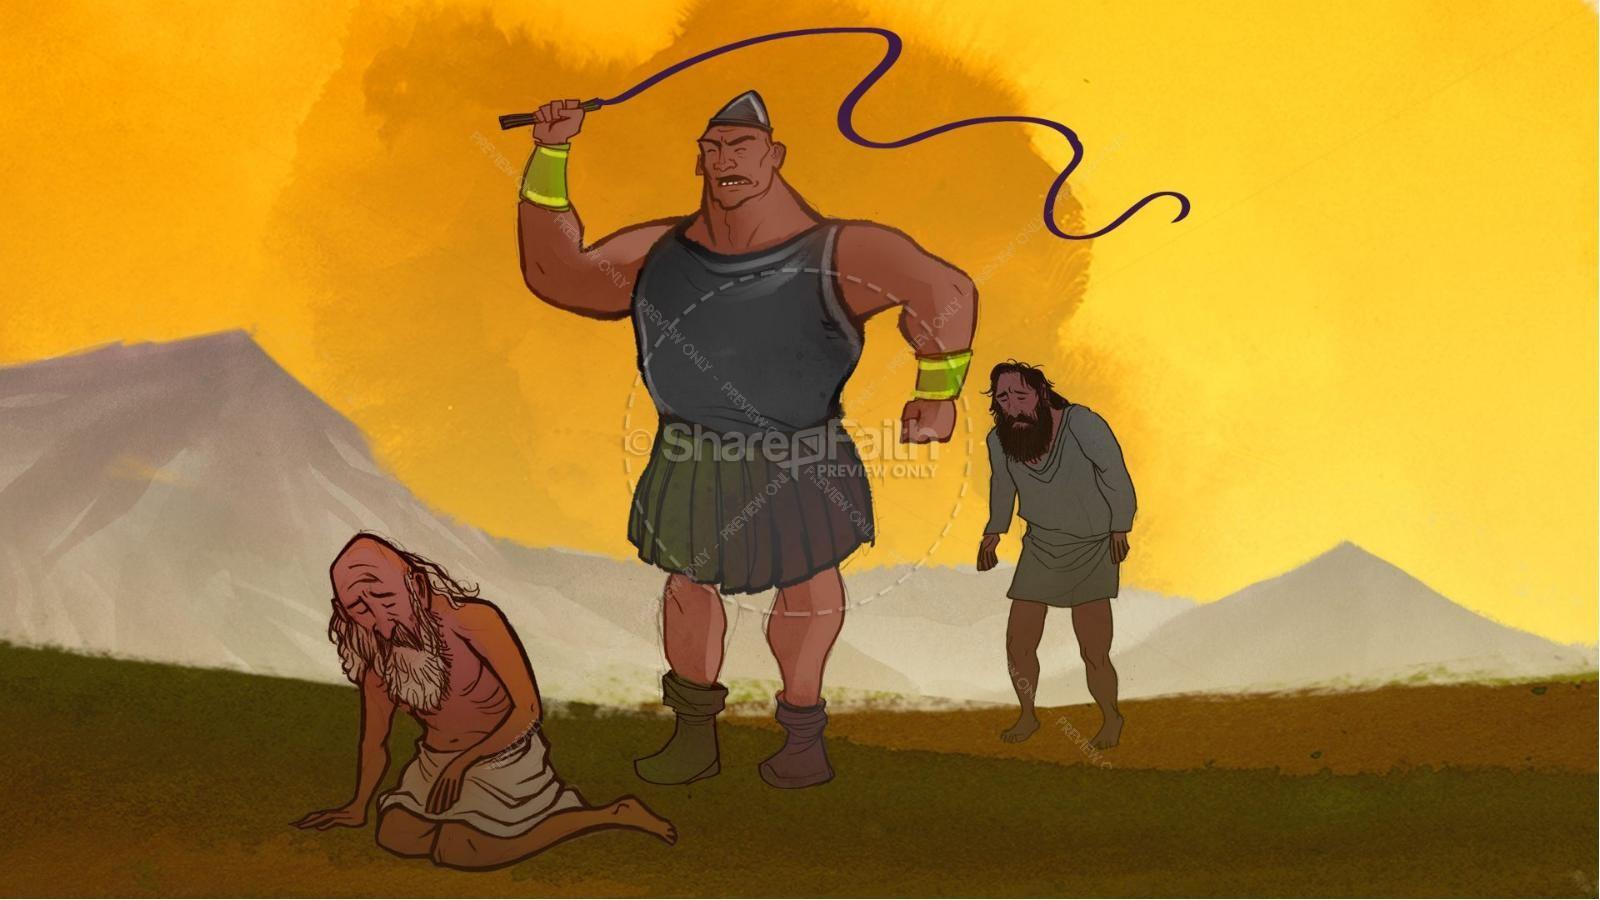 Samson and Delilah Kids Bible Stories | slide 2